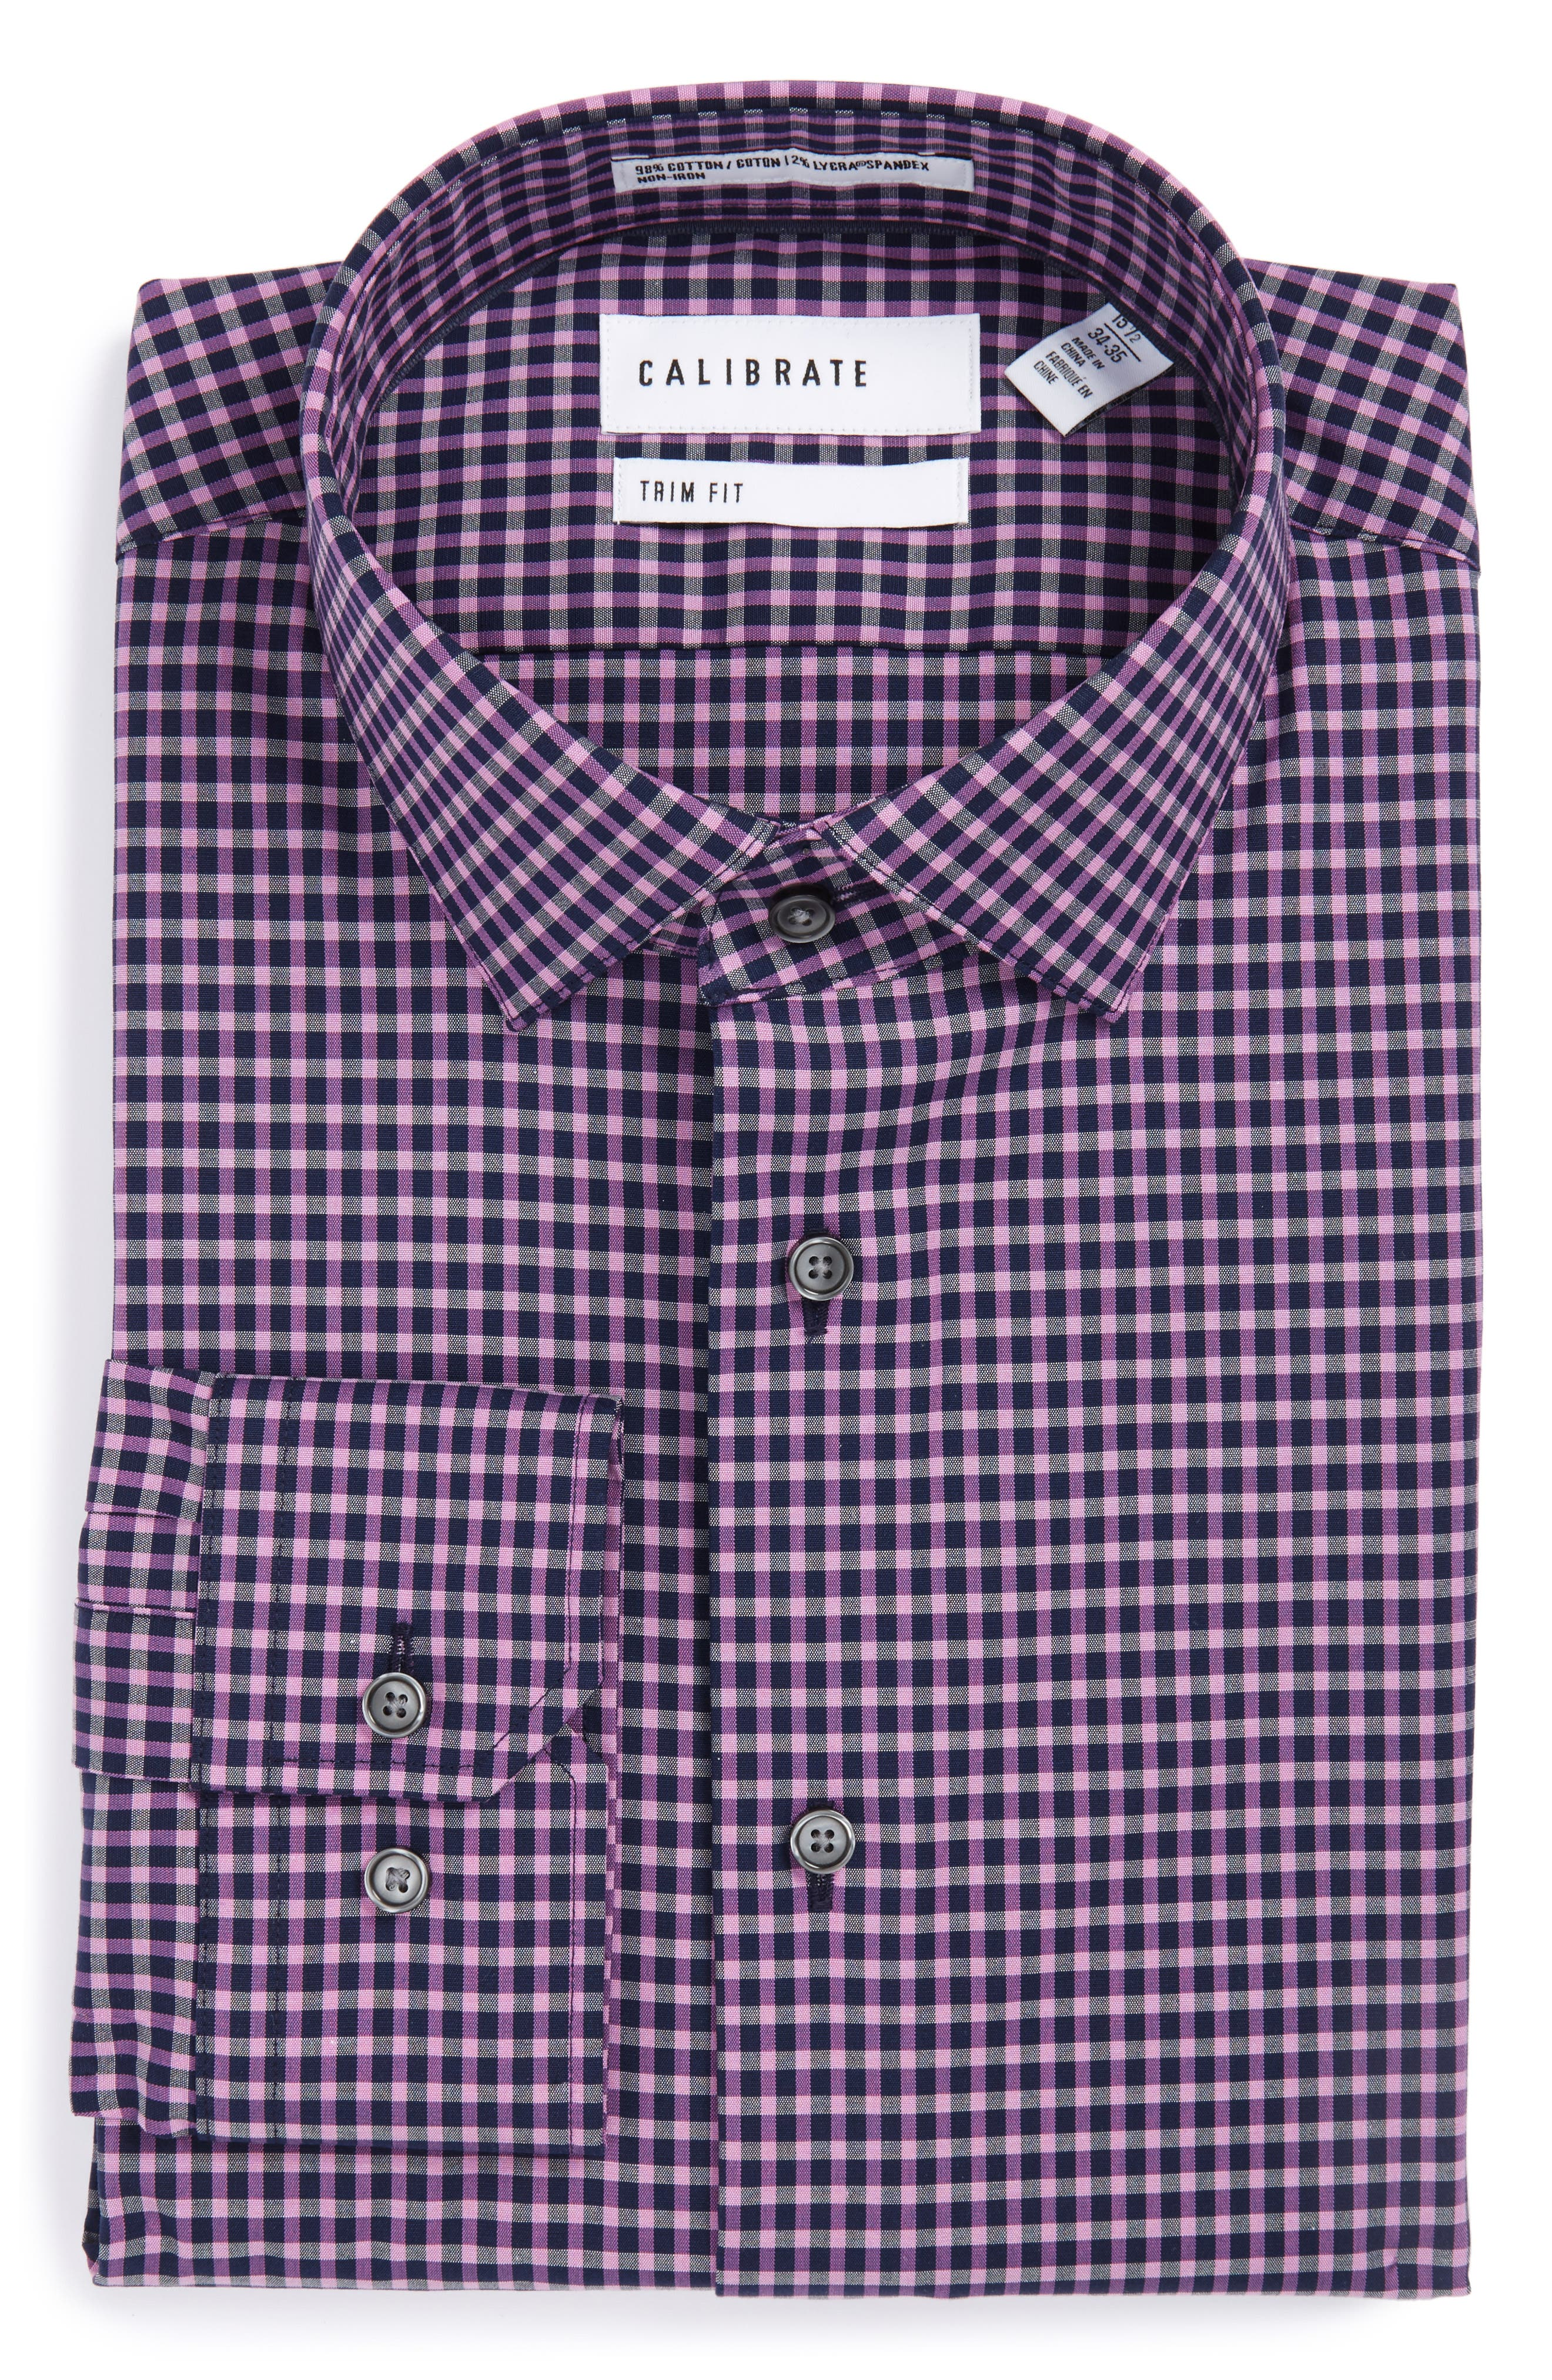 Main Image - Calibrate Trim Fit Non-Iron Check Stretch Dress Shirt